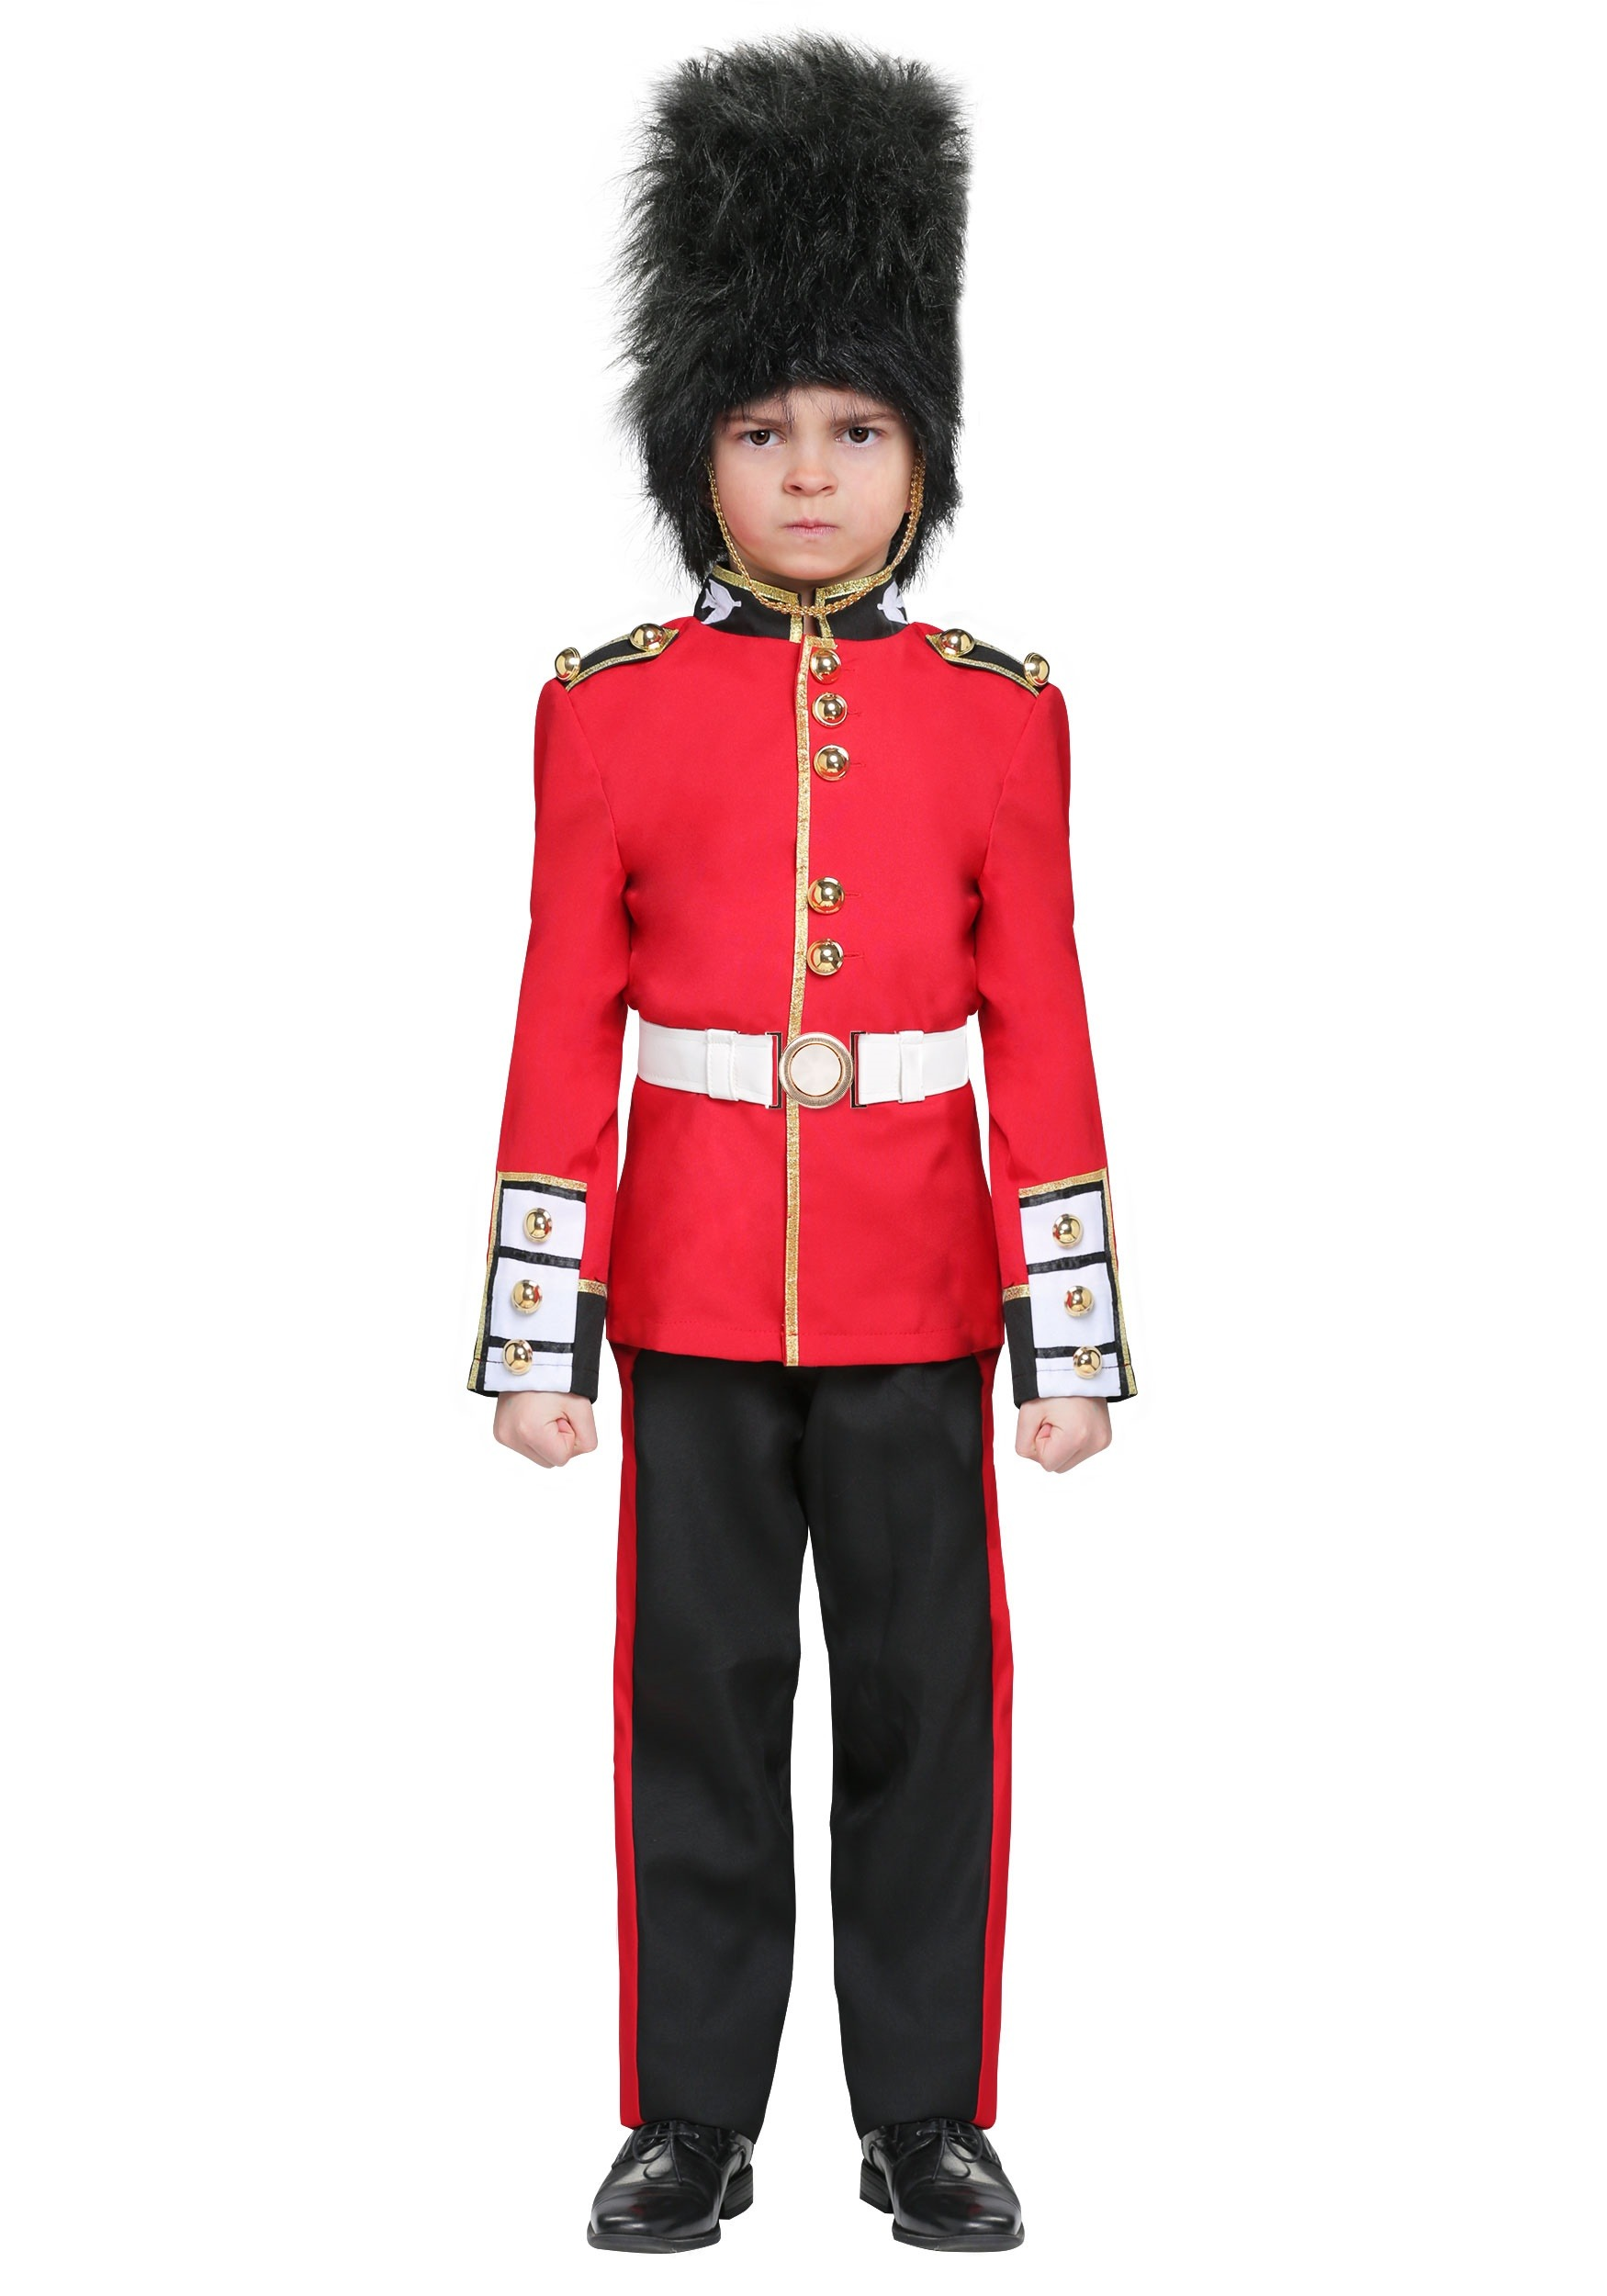 Child Royal Guard Costume